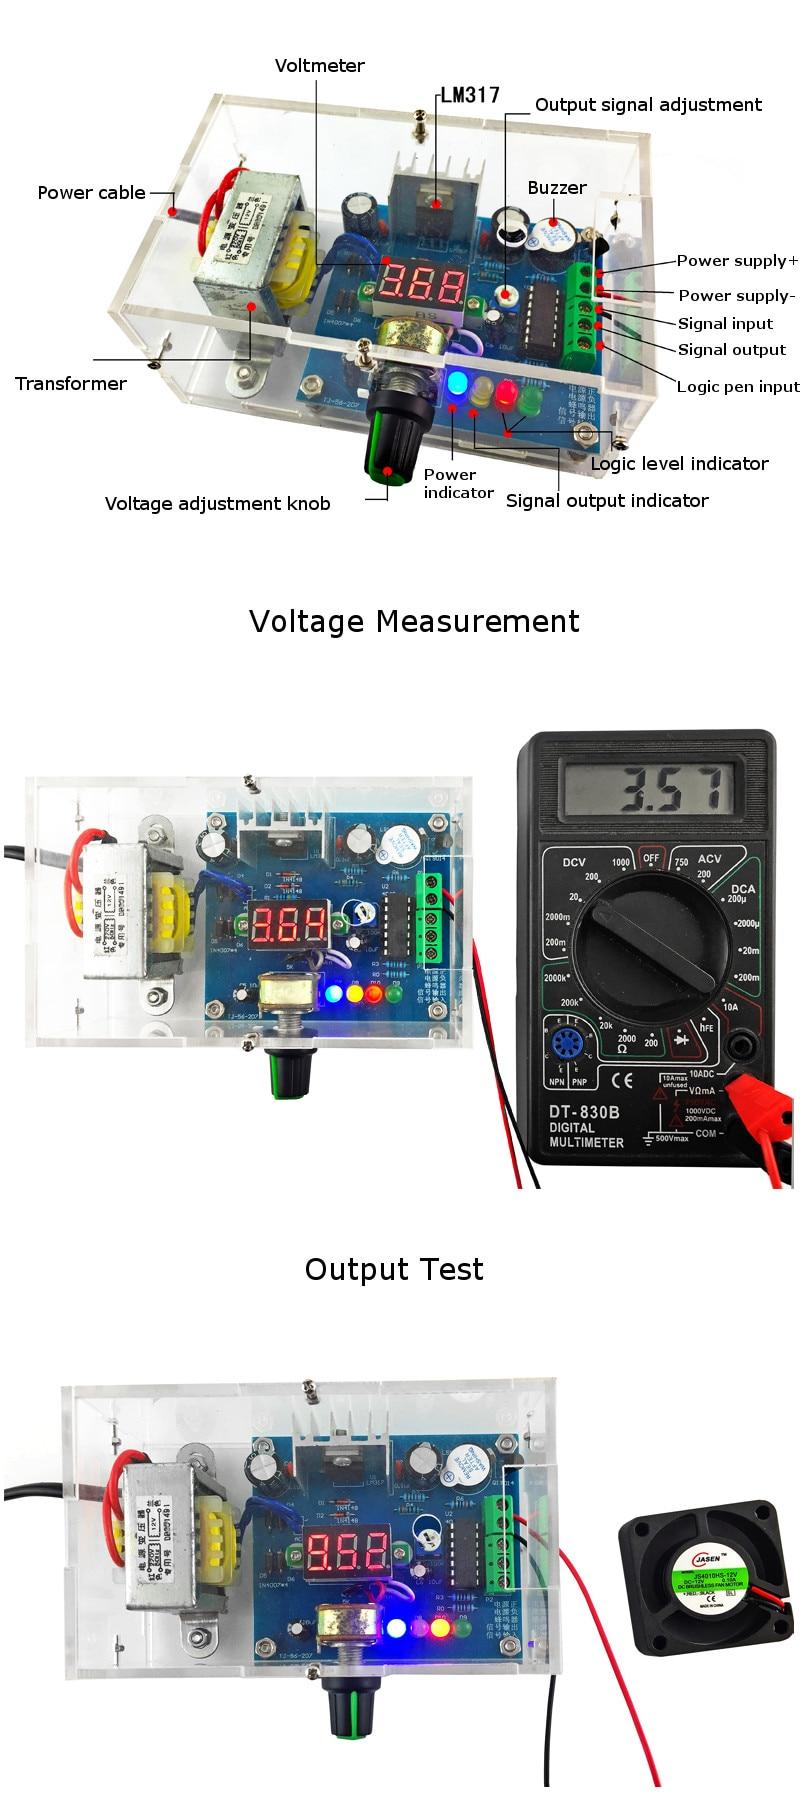 Diy Ac 220v To Dc 125v 12v Lm317 Adjustable Voltage Power Supply An Breadboard By 1 X Board Kit